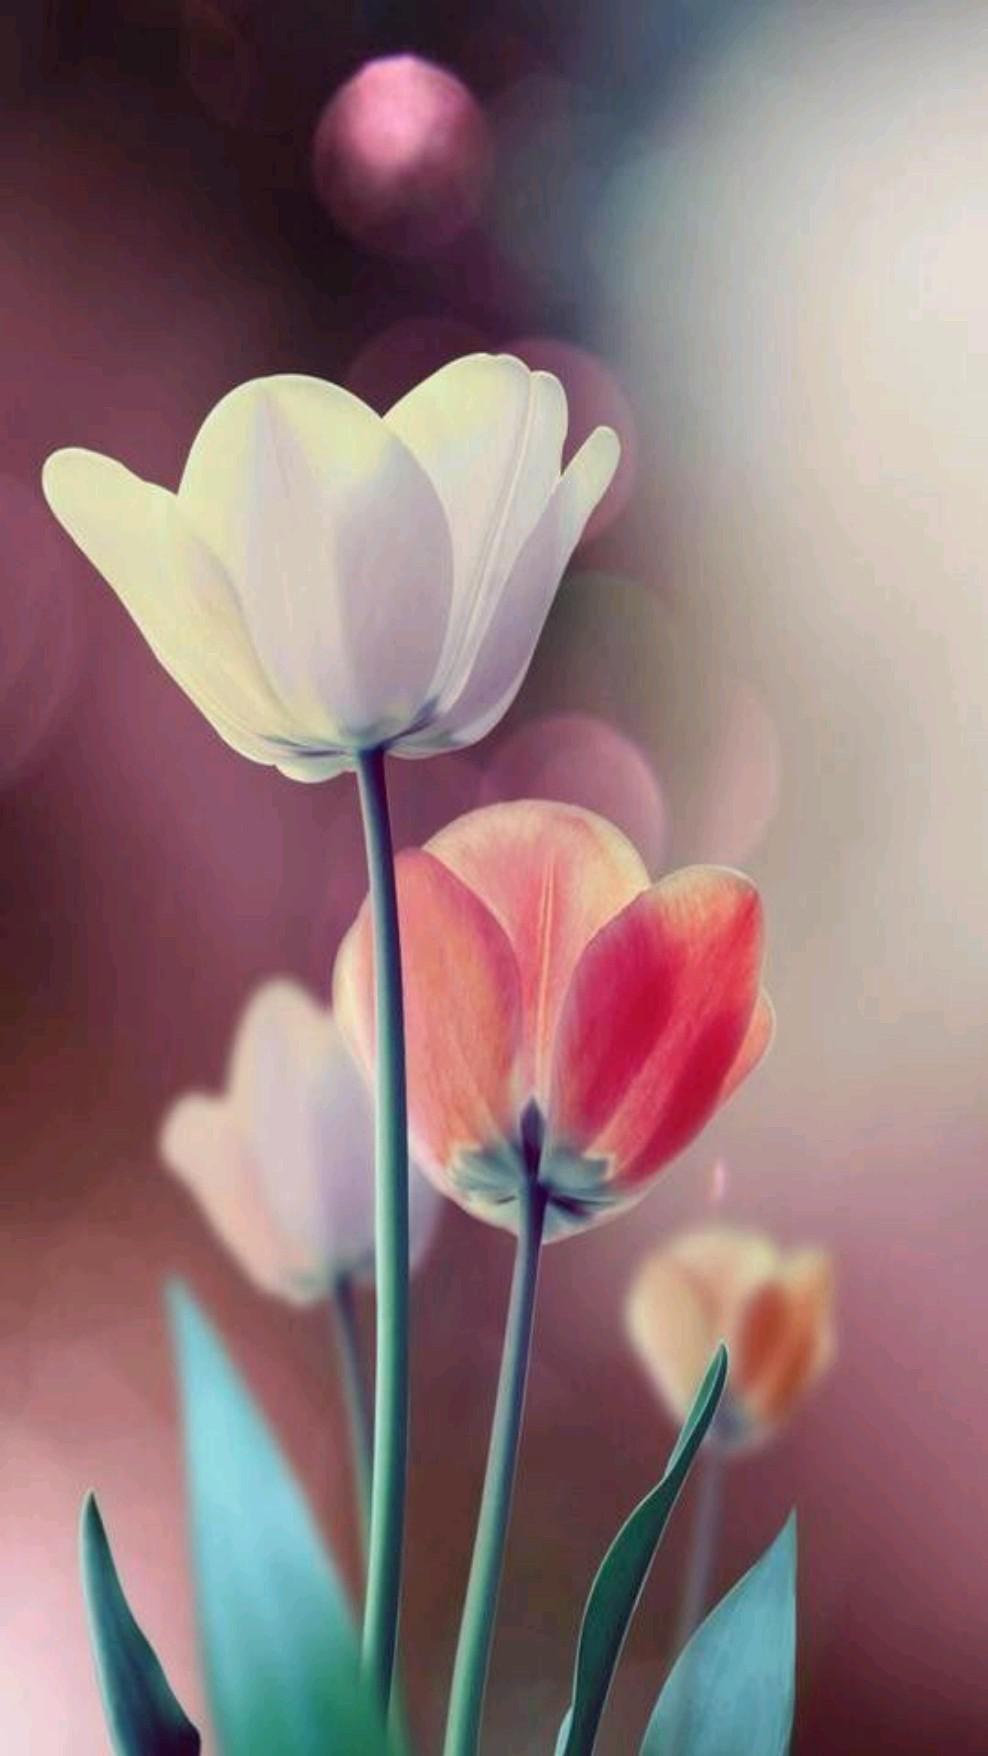 Flower buds rose tulip white red orange tulip